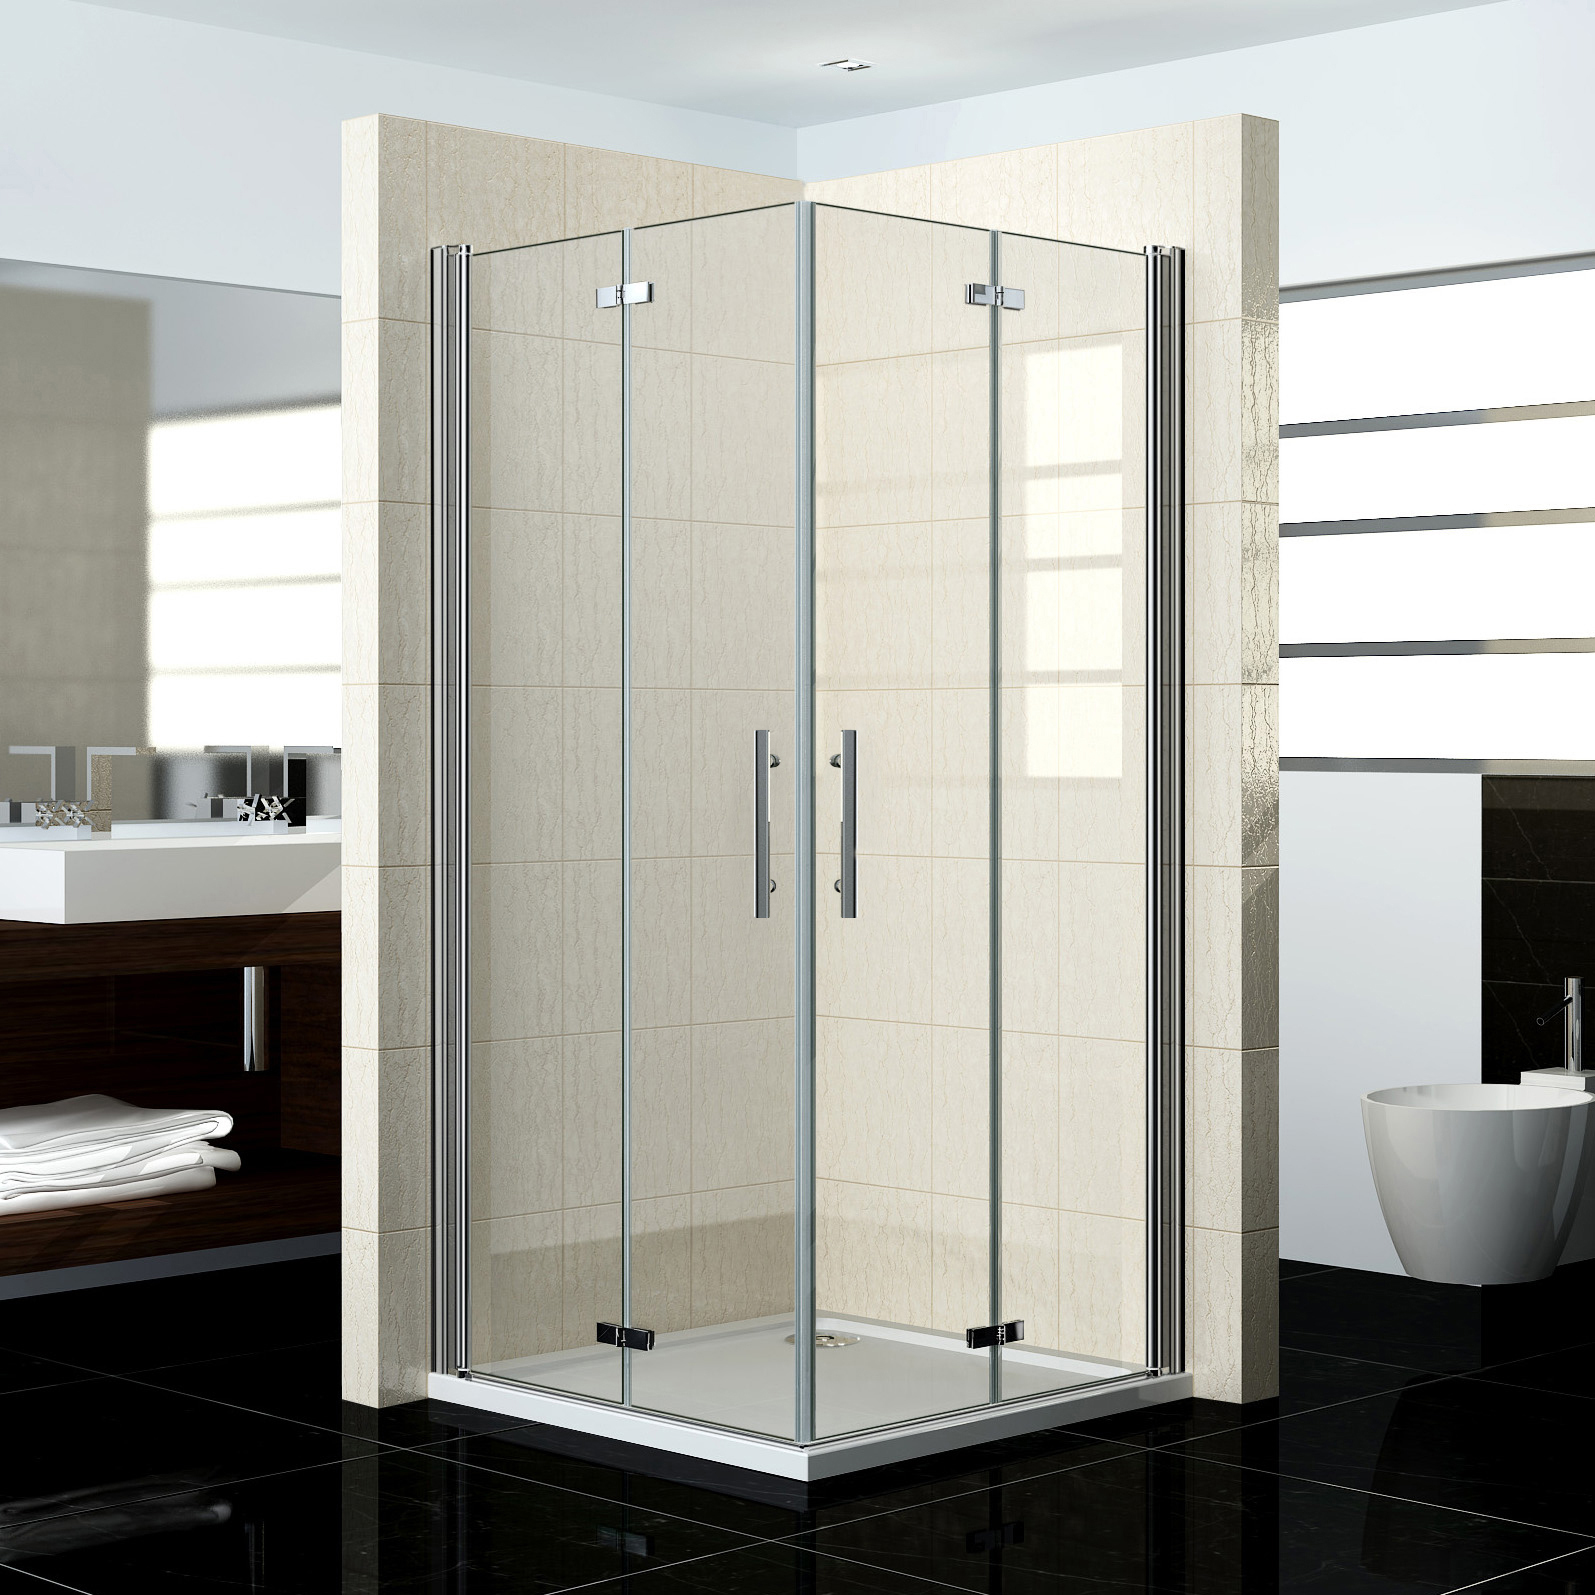 duschkabine glas 100 100 ix29 hitoiro. Black Bedroom Furniture Sets. Home Design Ideas